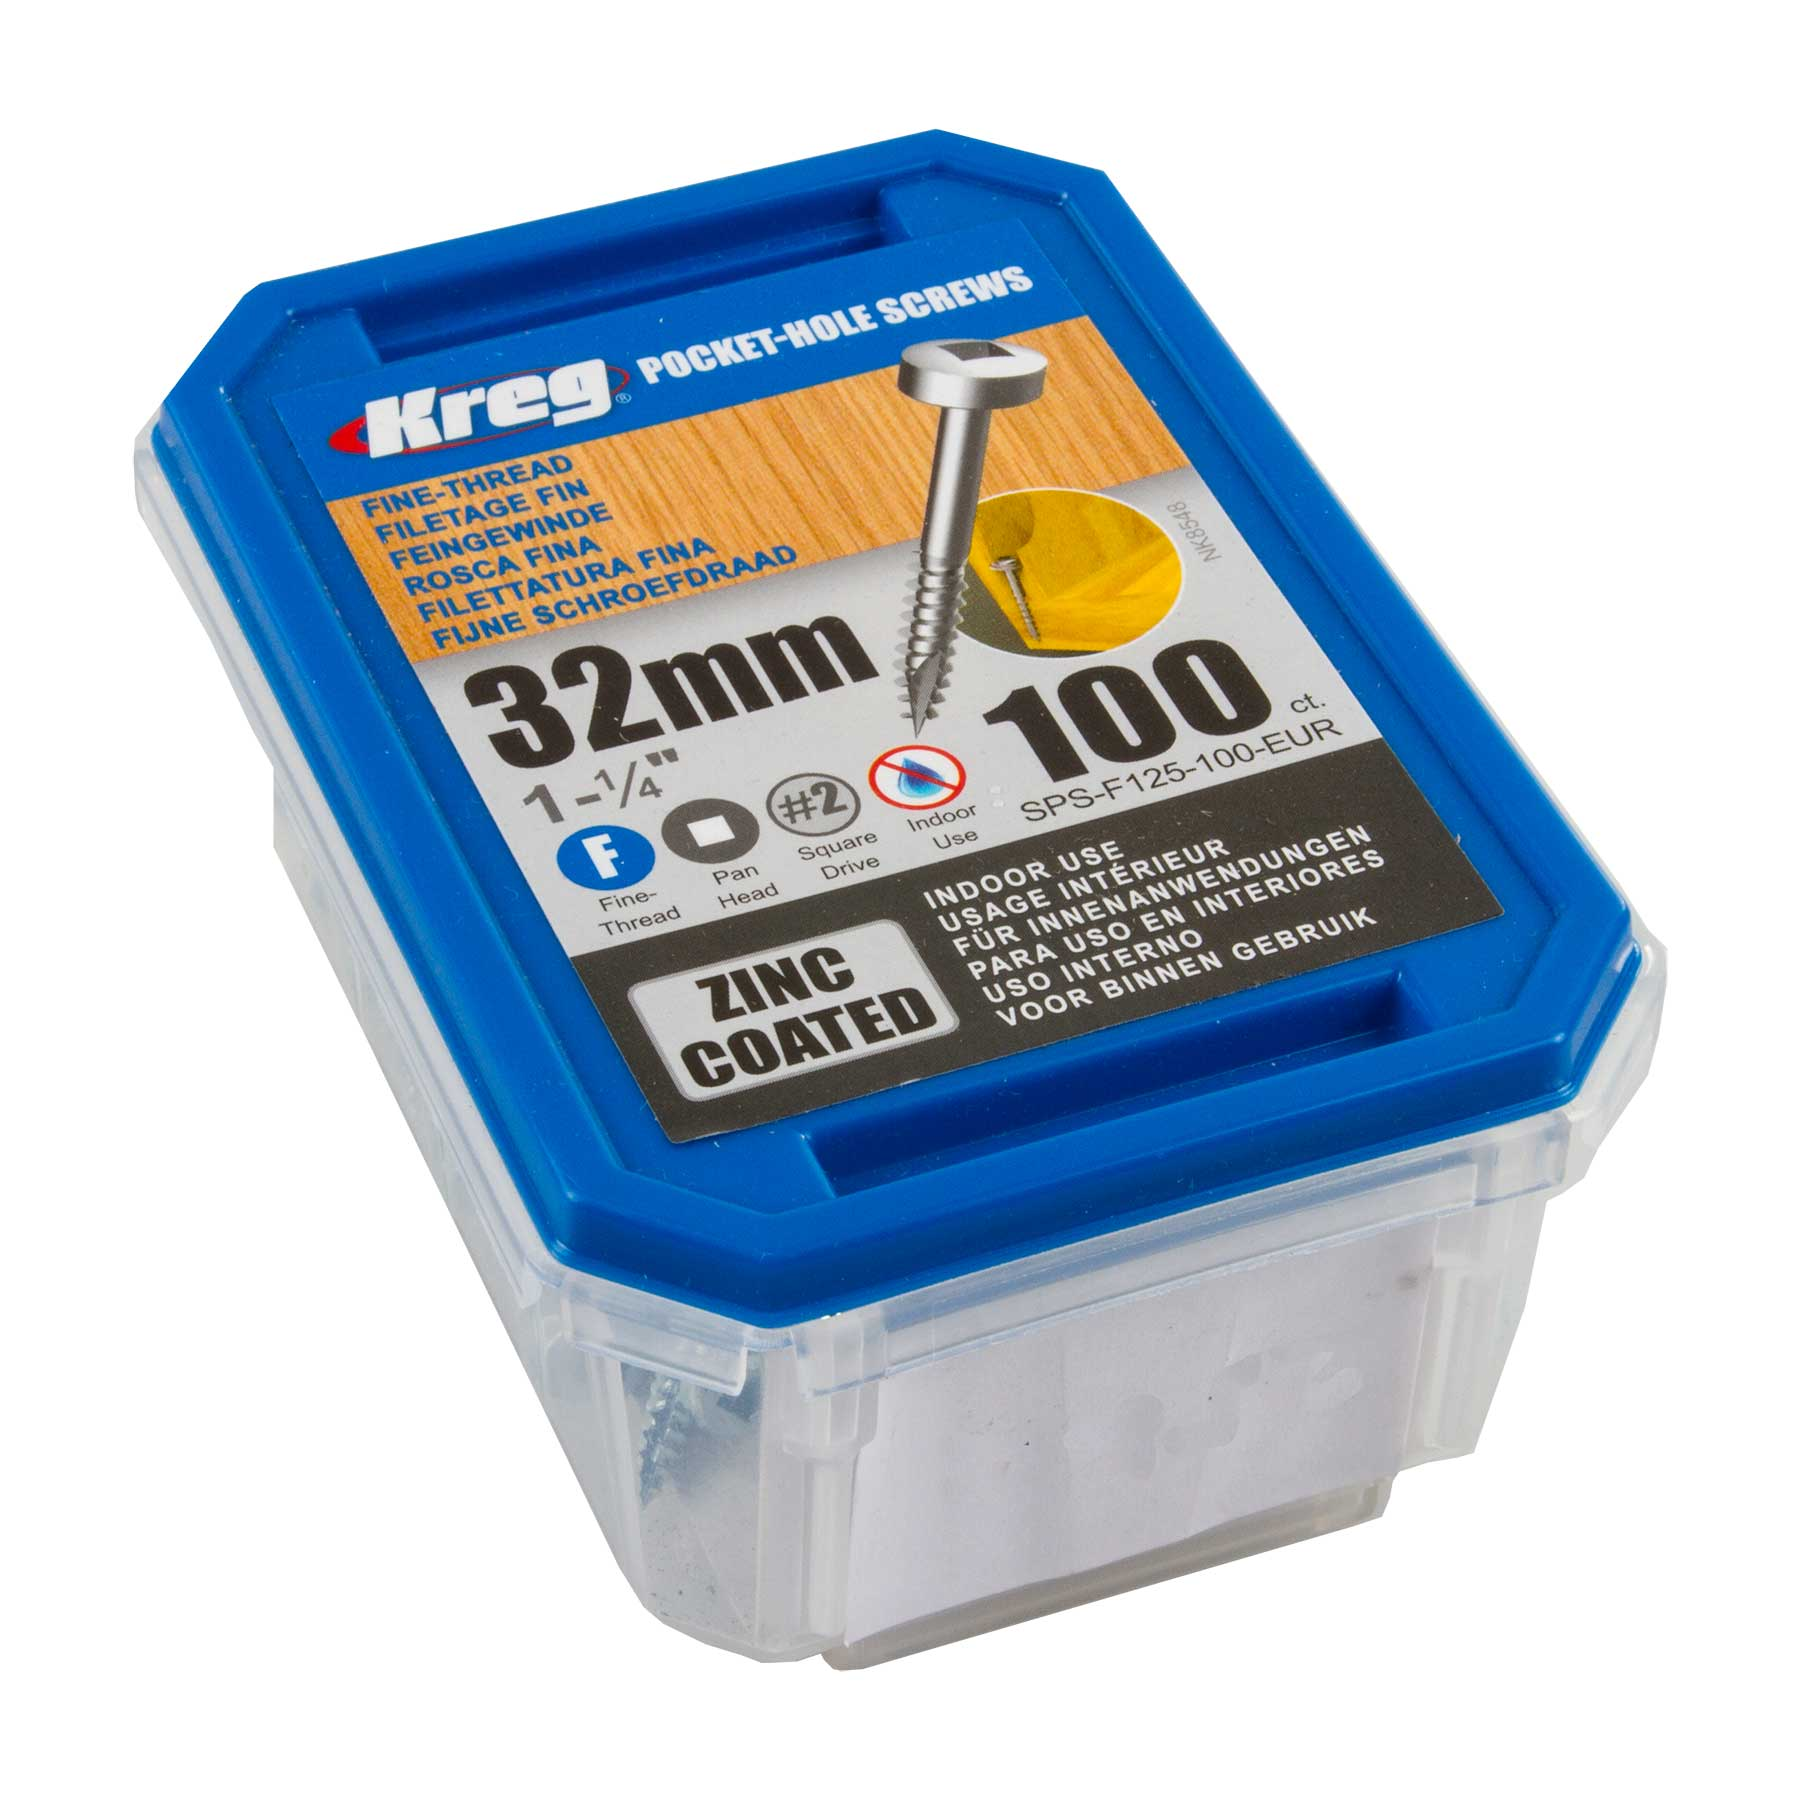 Kreg SPS-F125-100-EUR Zinc Pocket-Hole Screws Pan Head Fine No 6 x 1-1/4